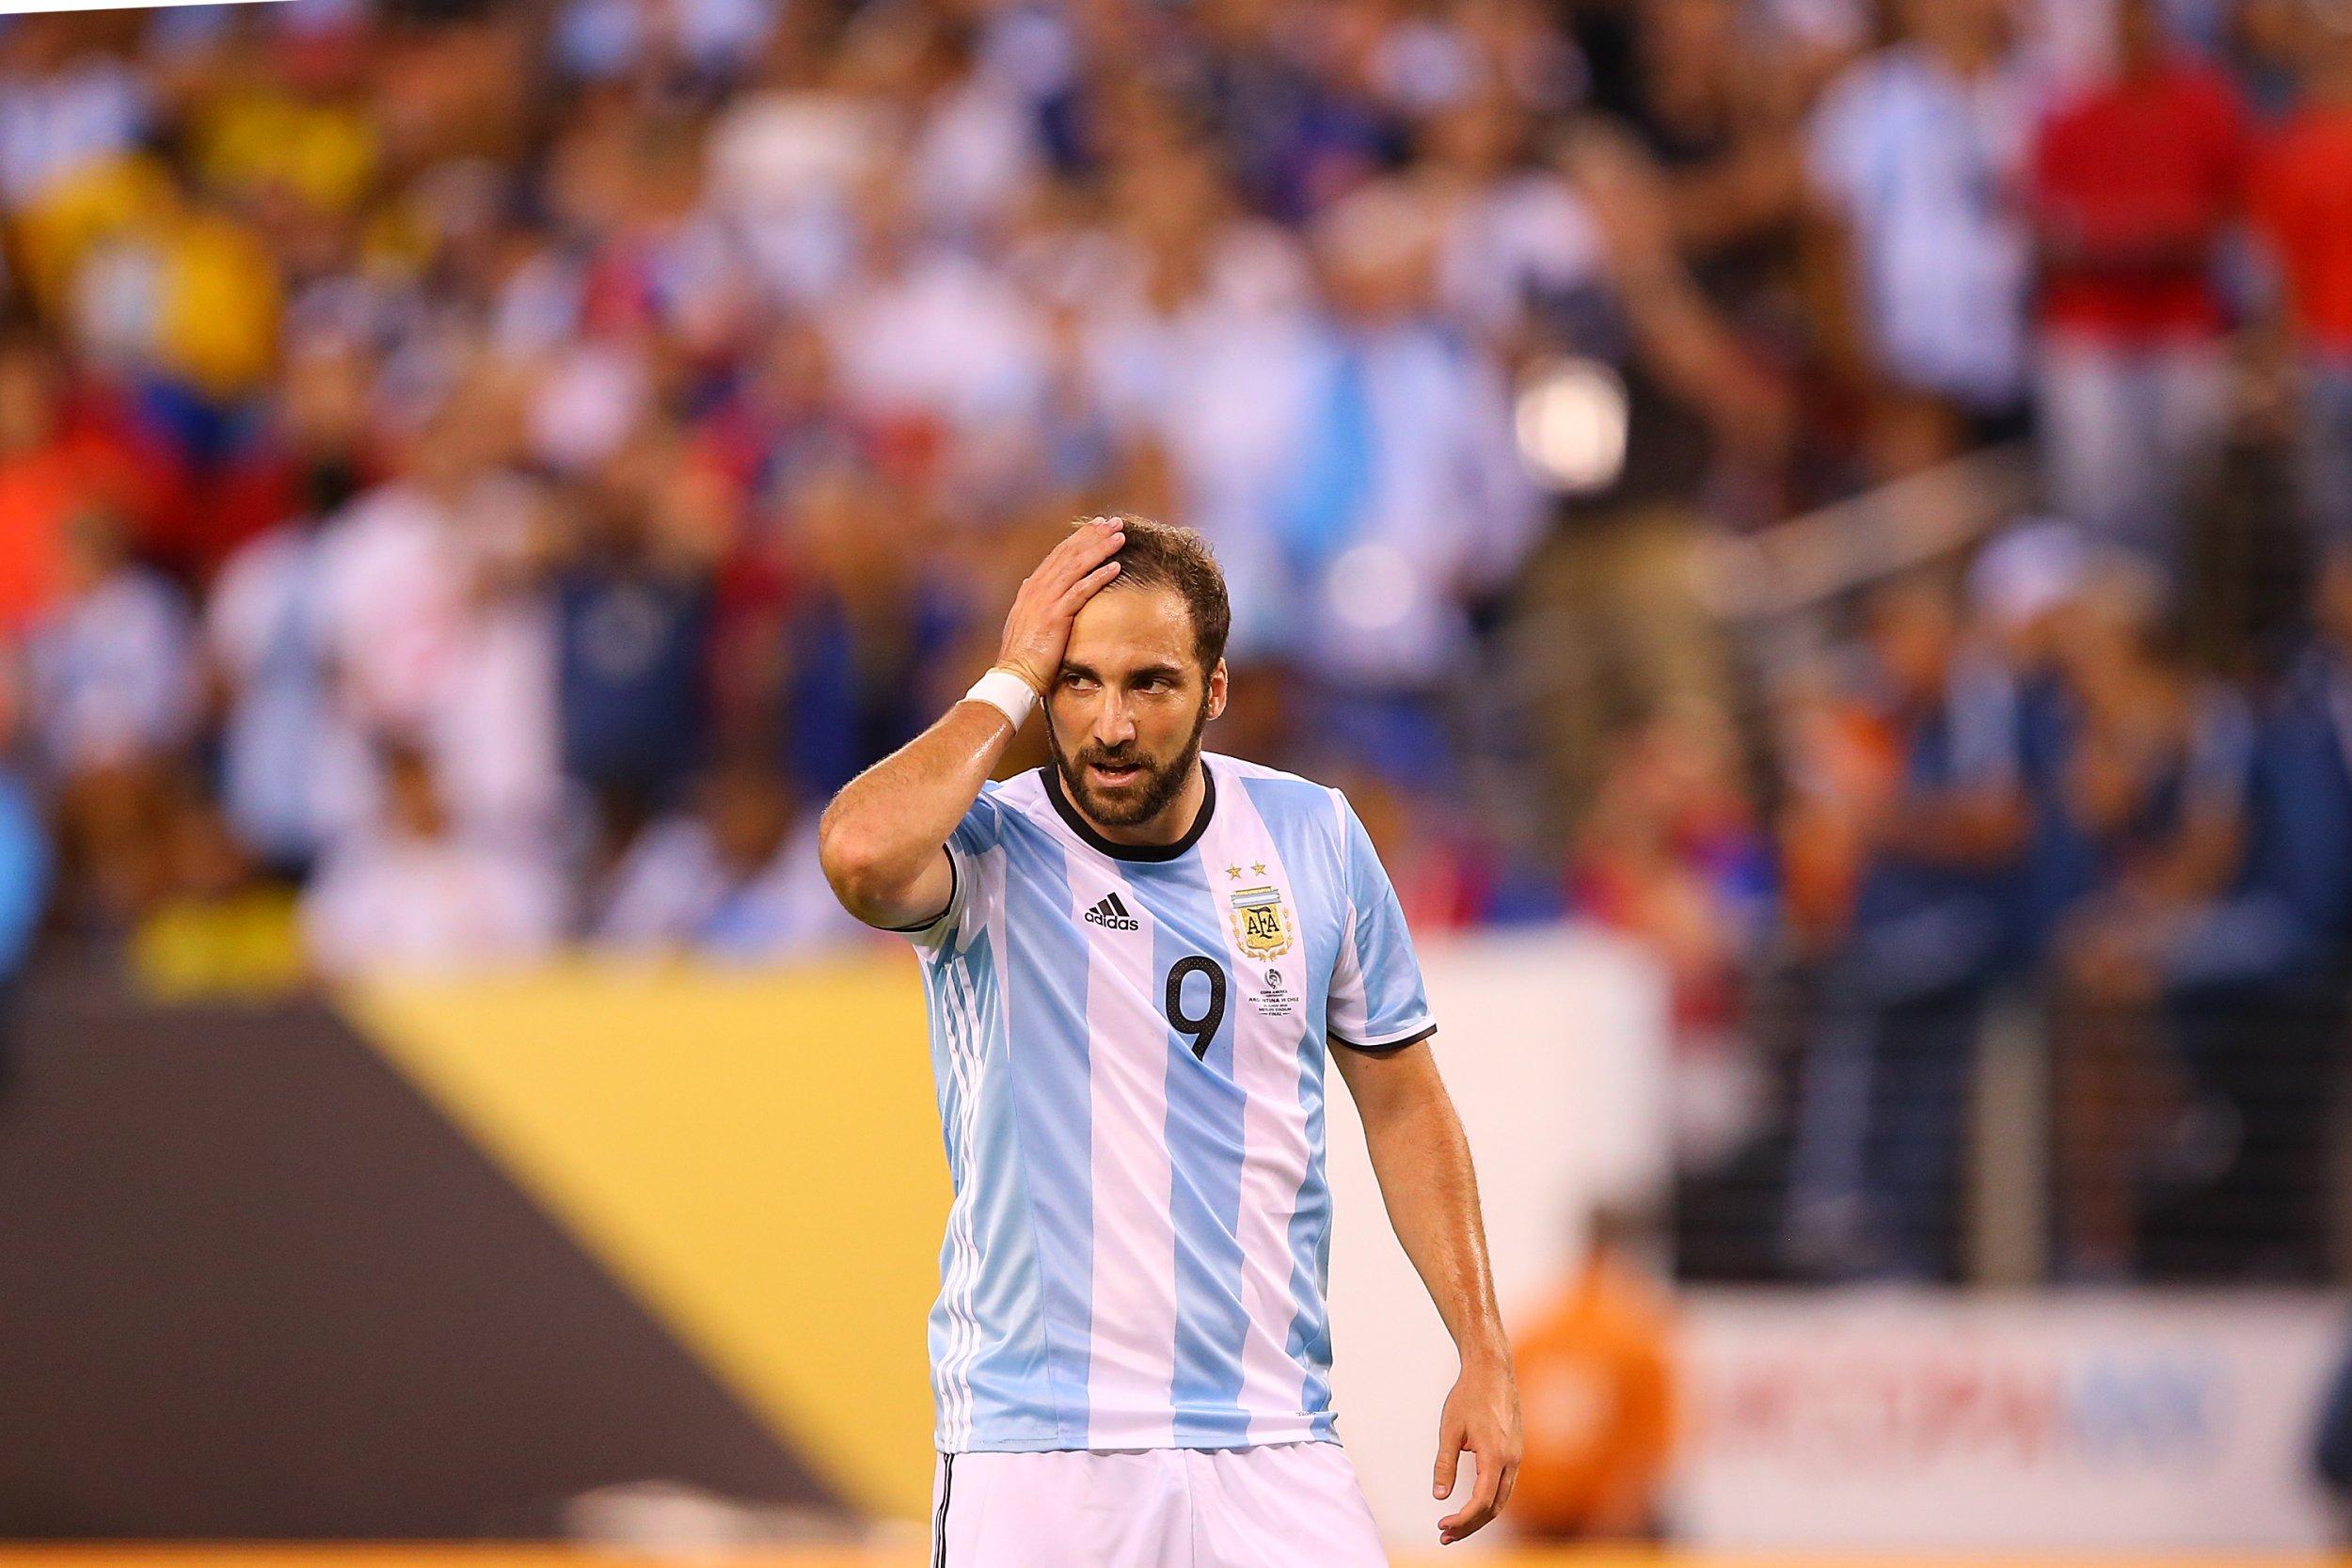 Napoli and Argentina striker Gonzalo Higuain